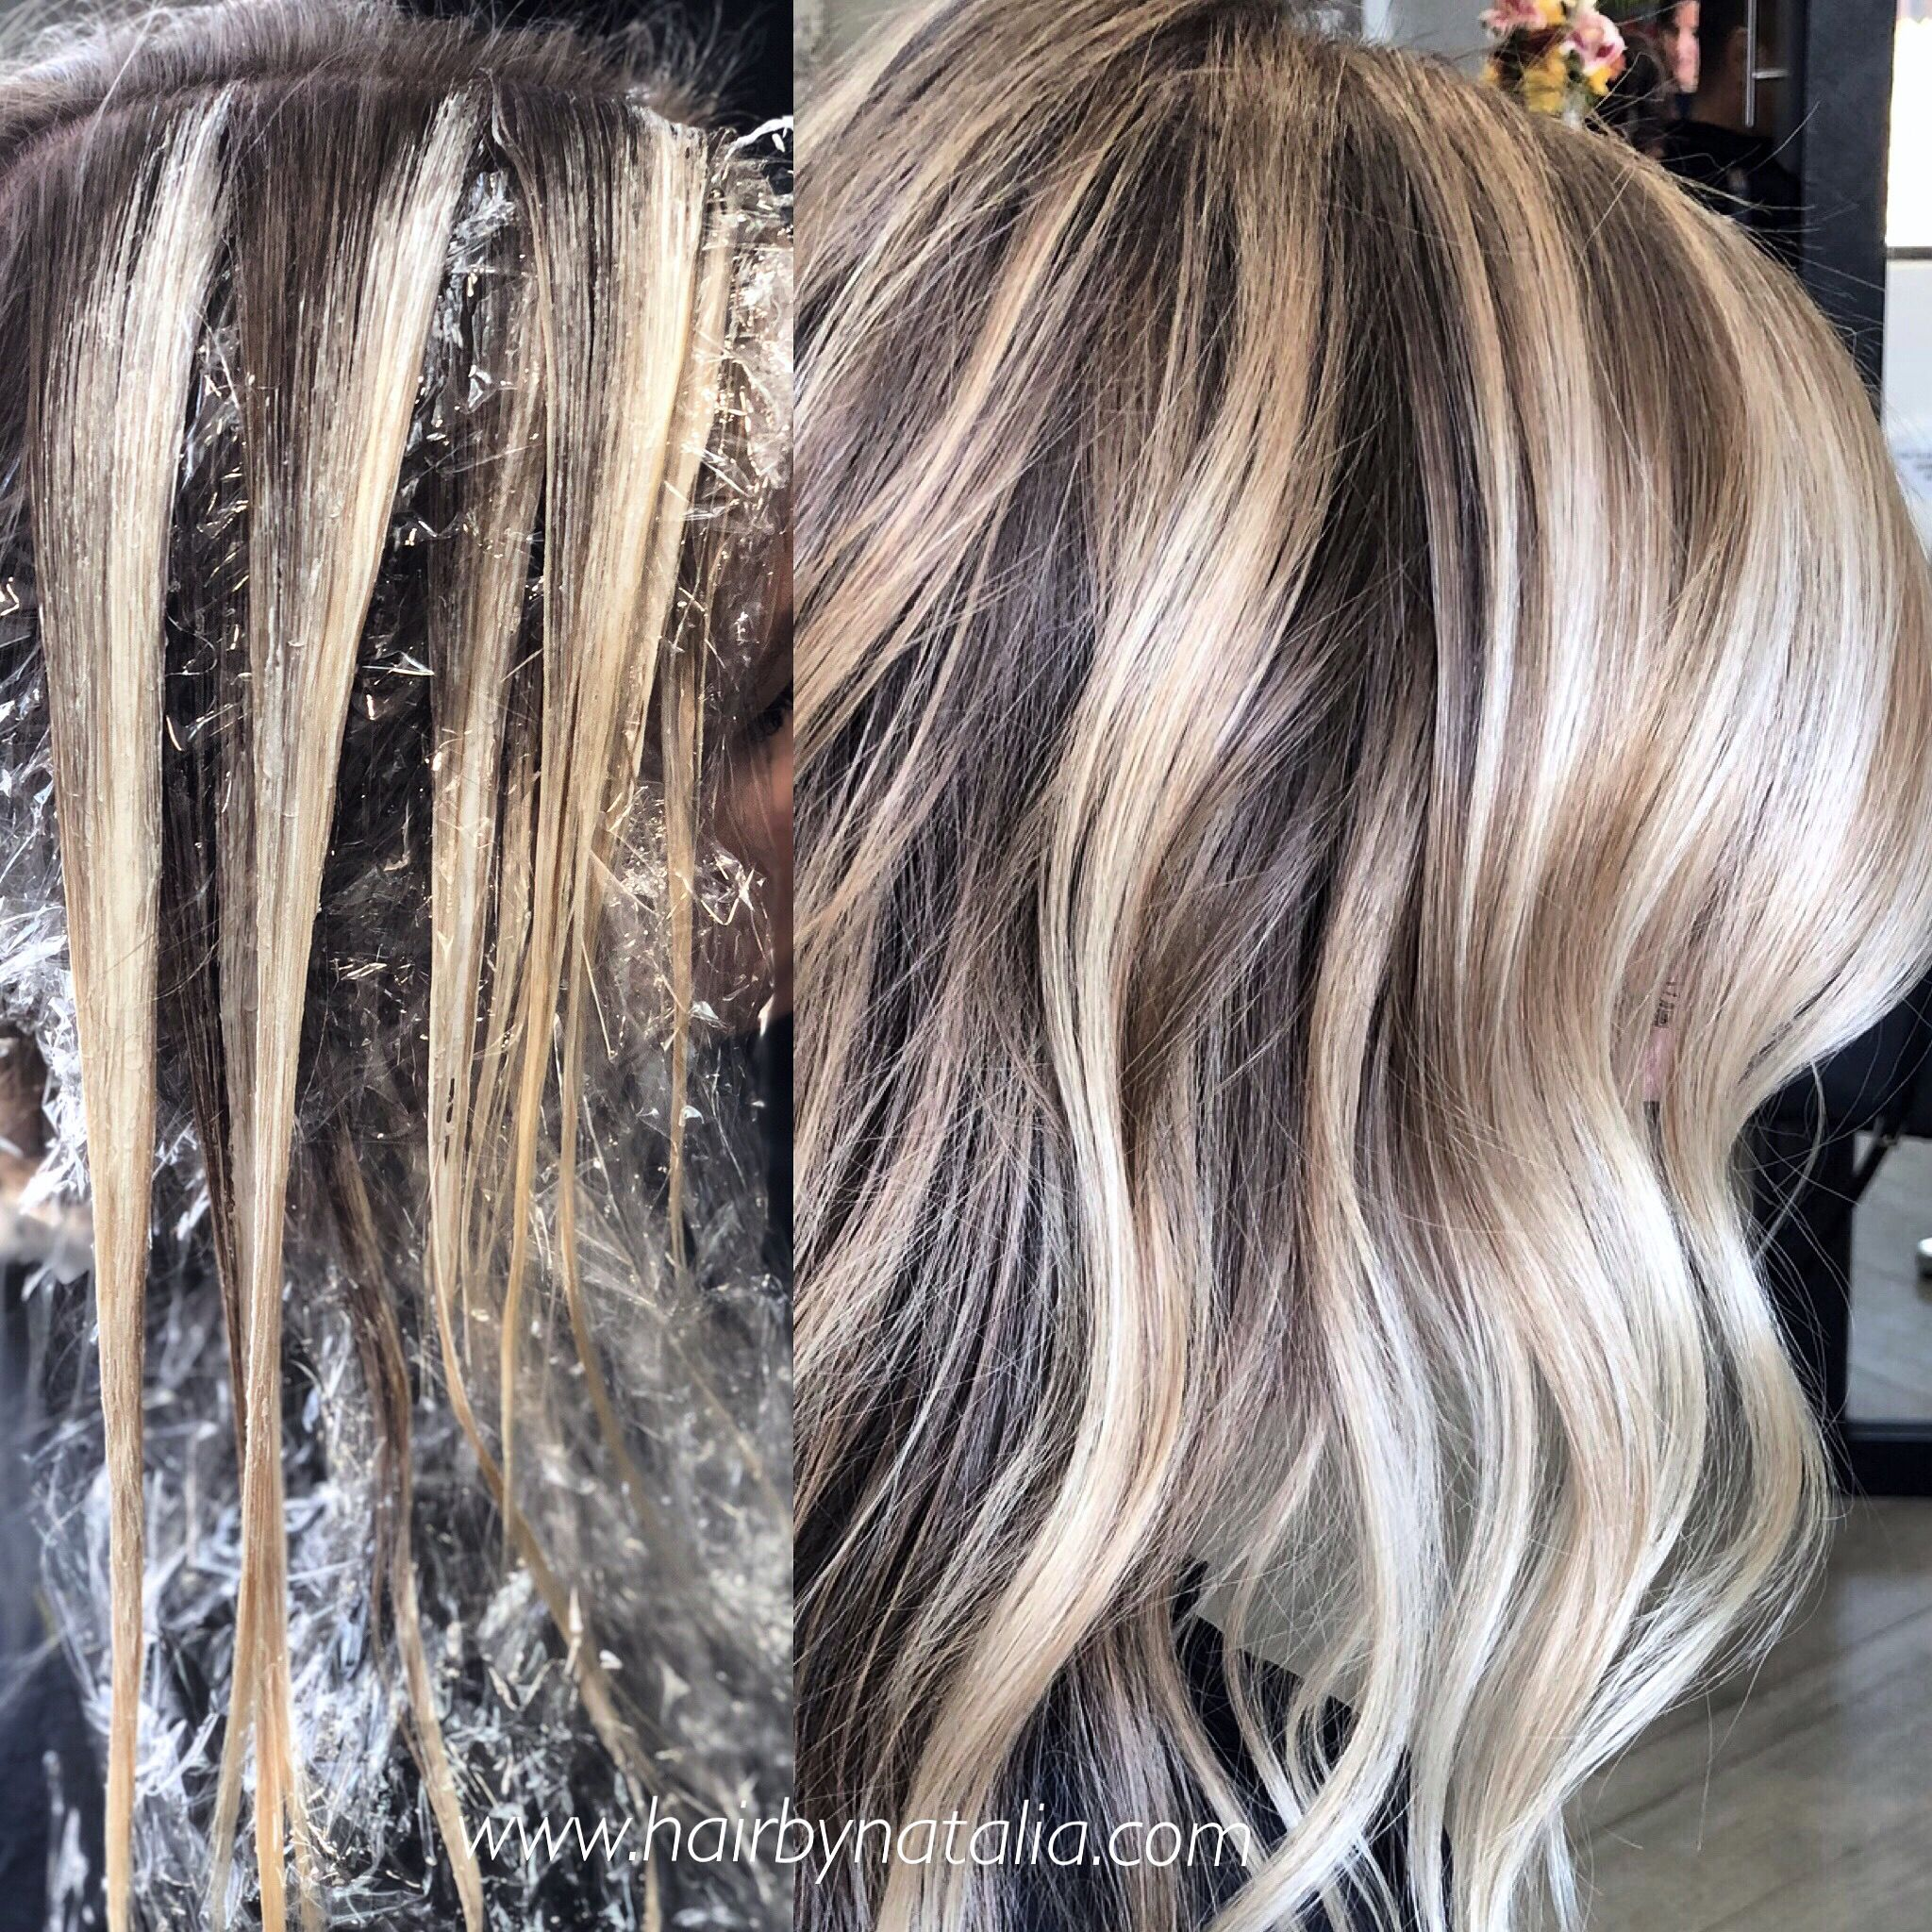 Chery Creek Hair Salon. Balayage and Blonde Specia